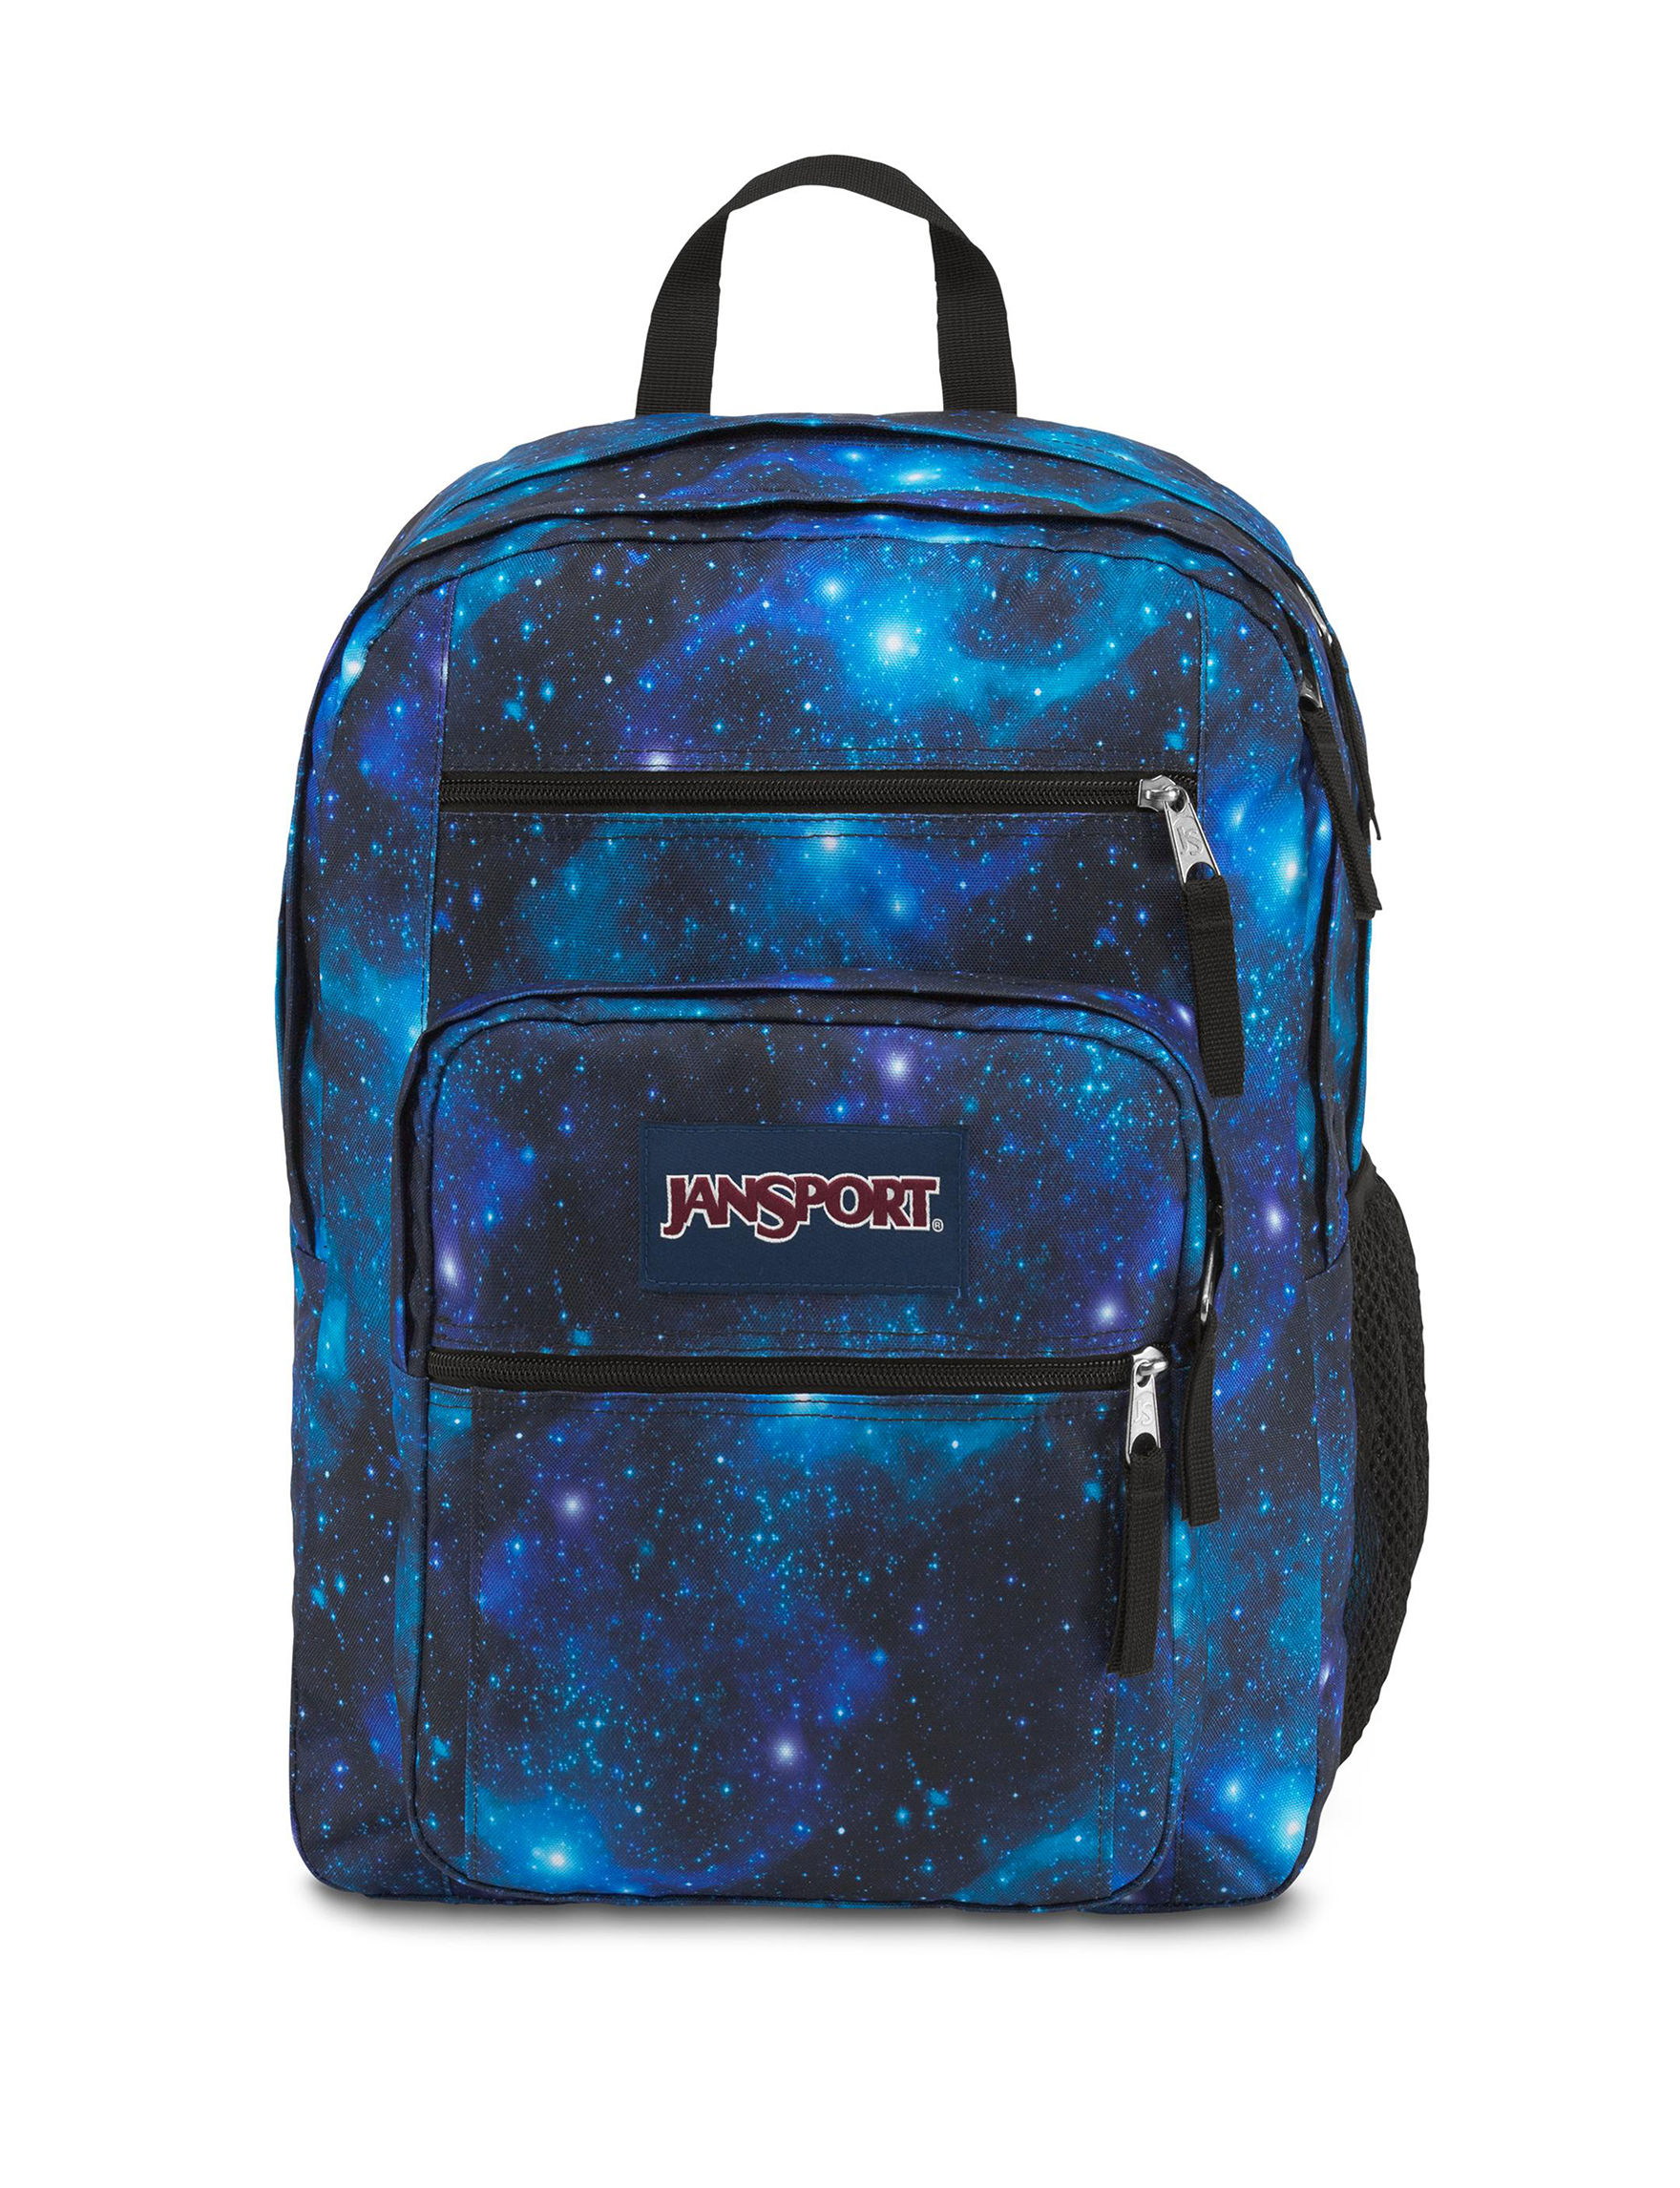 Jansport Galaxy Bookbags & Backpacks